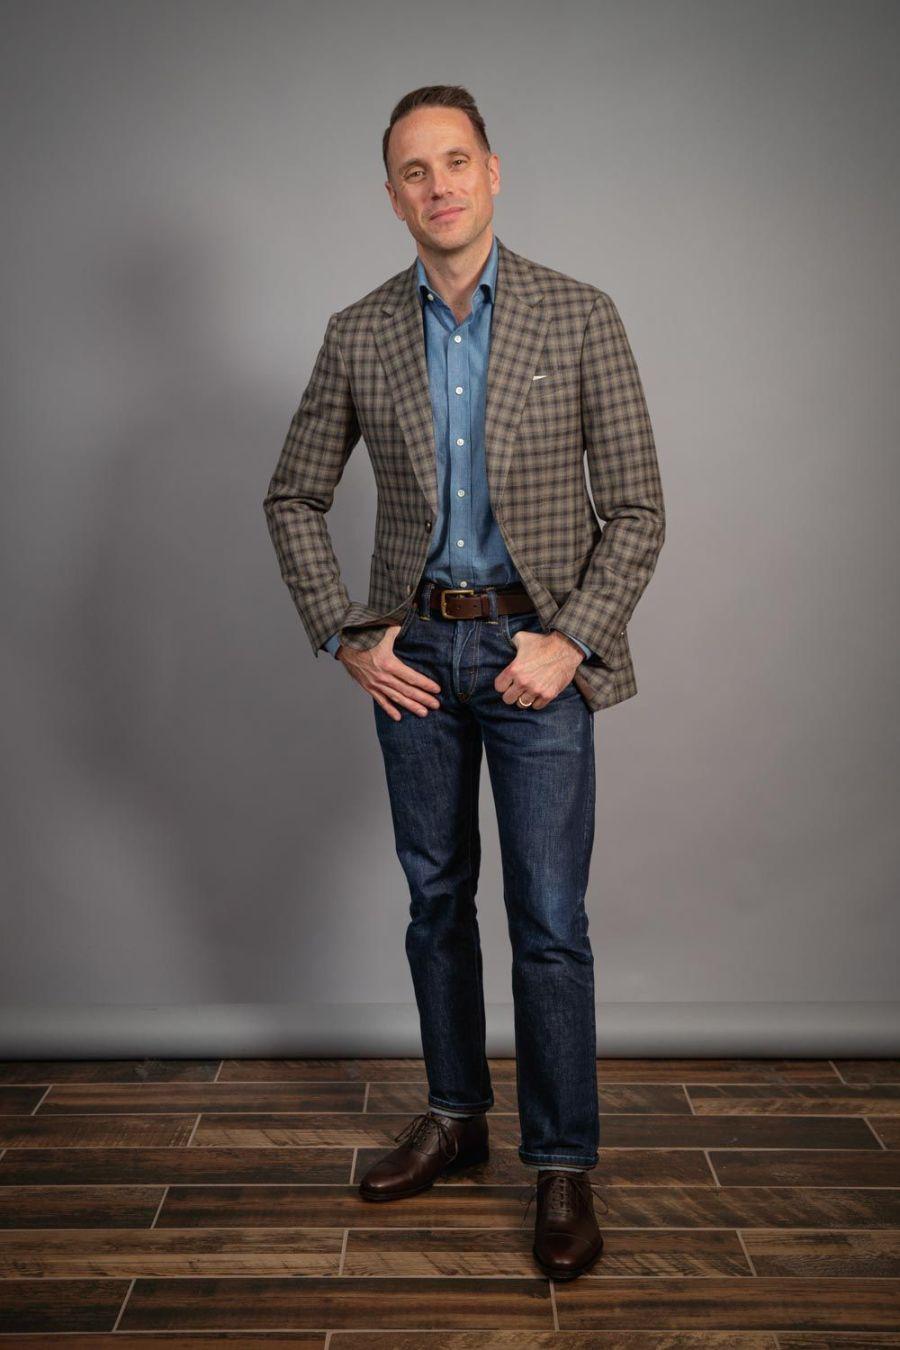 capsule-wardrobe-for-men-gun-club-sports-jacket-and-jeans-denim-shirt-brown-shoes